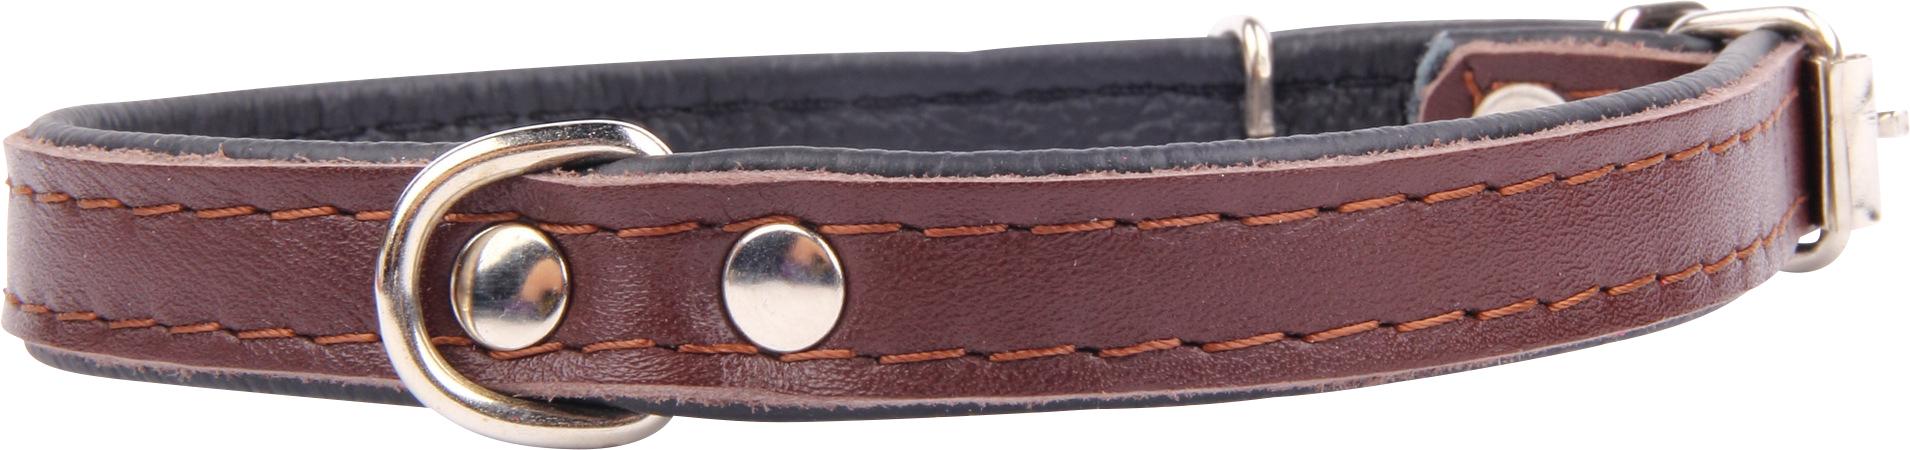 Läderhalsband, brun 60 cm